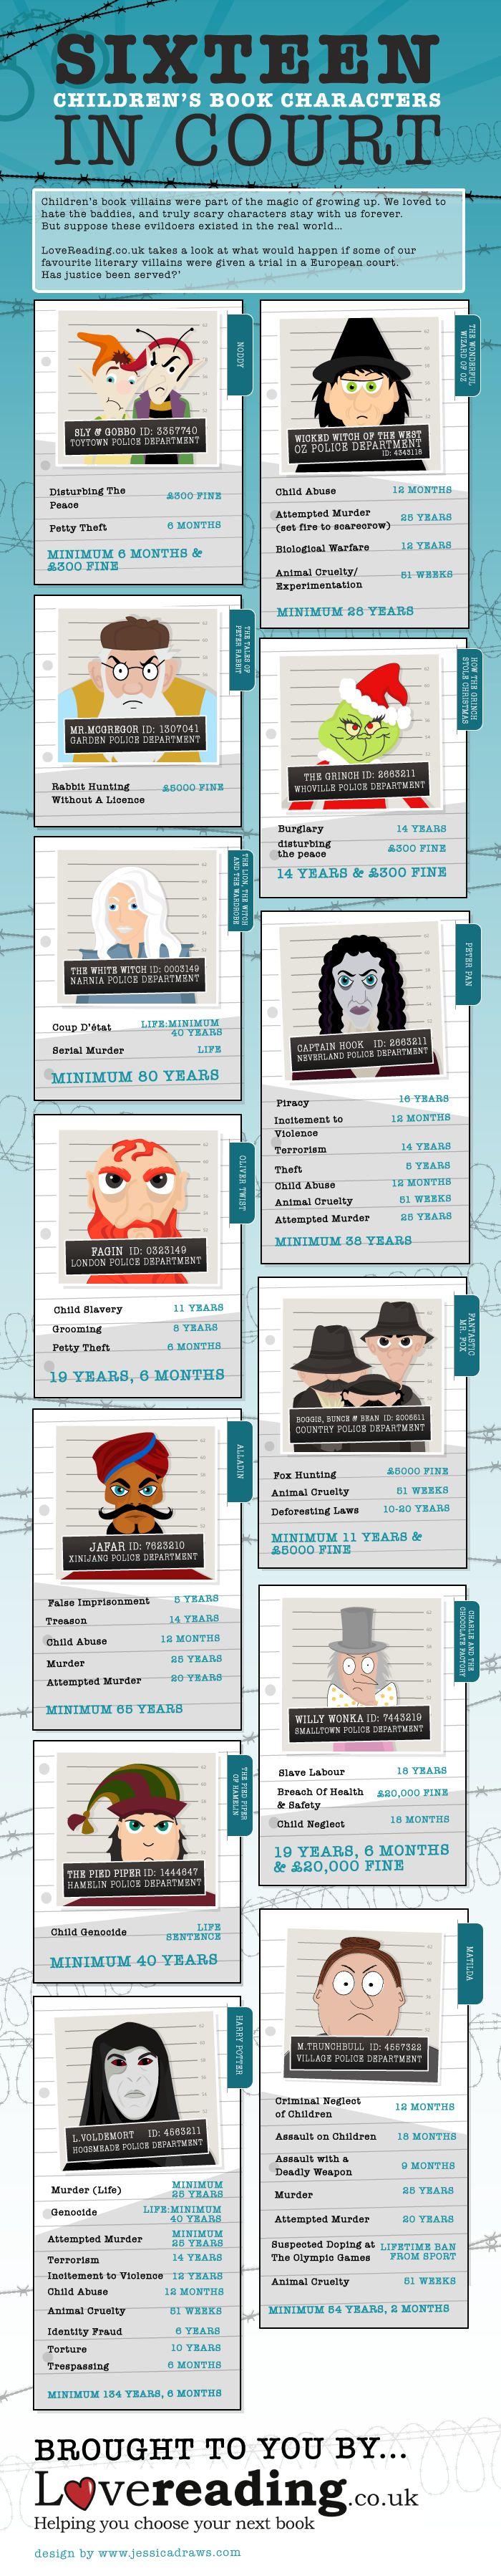 Best 79 Infografías ideas on Pinterest | Info graphics, Infographic ...